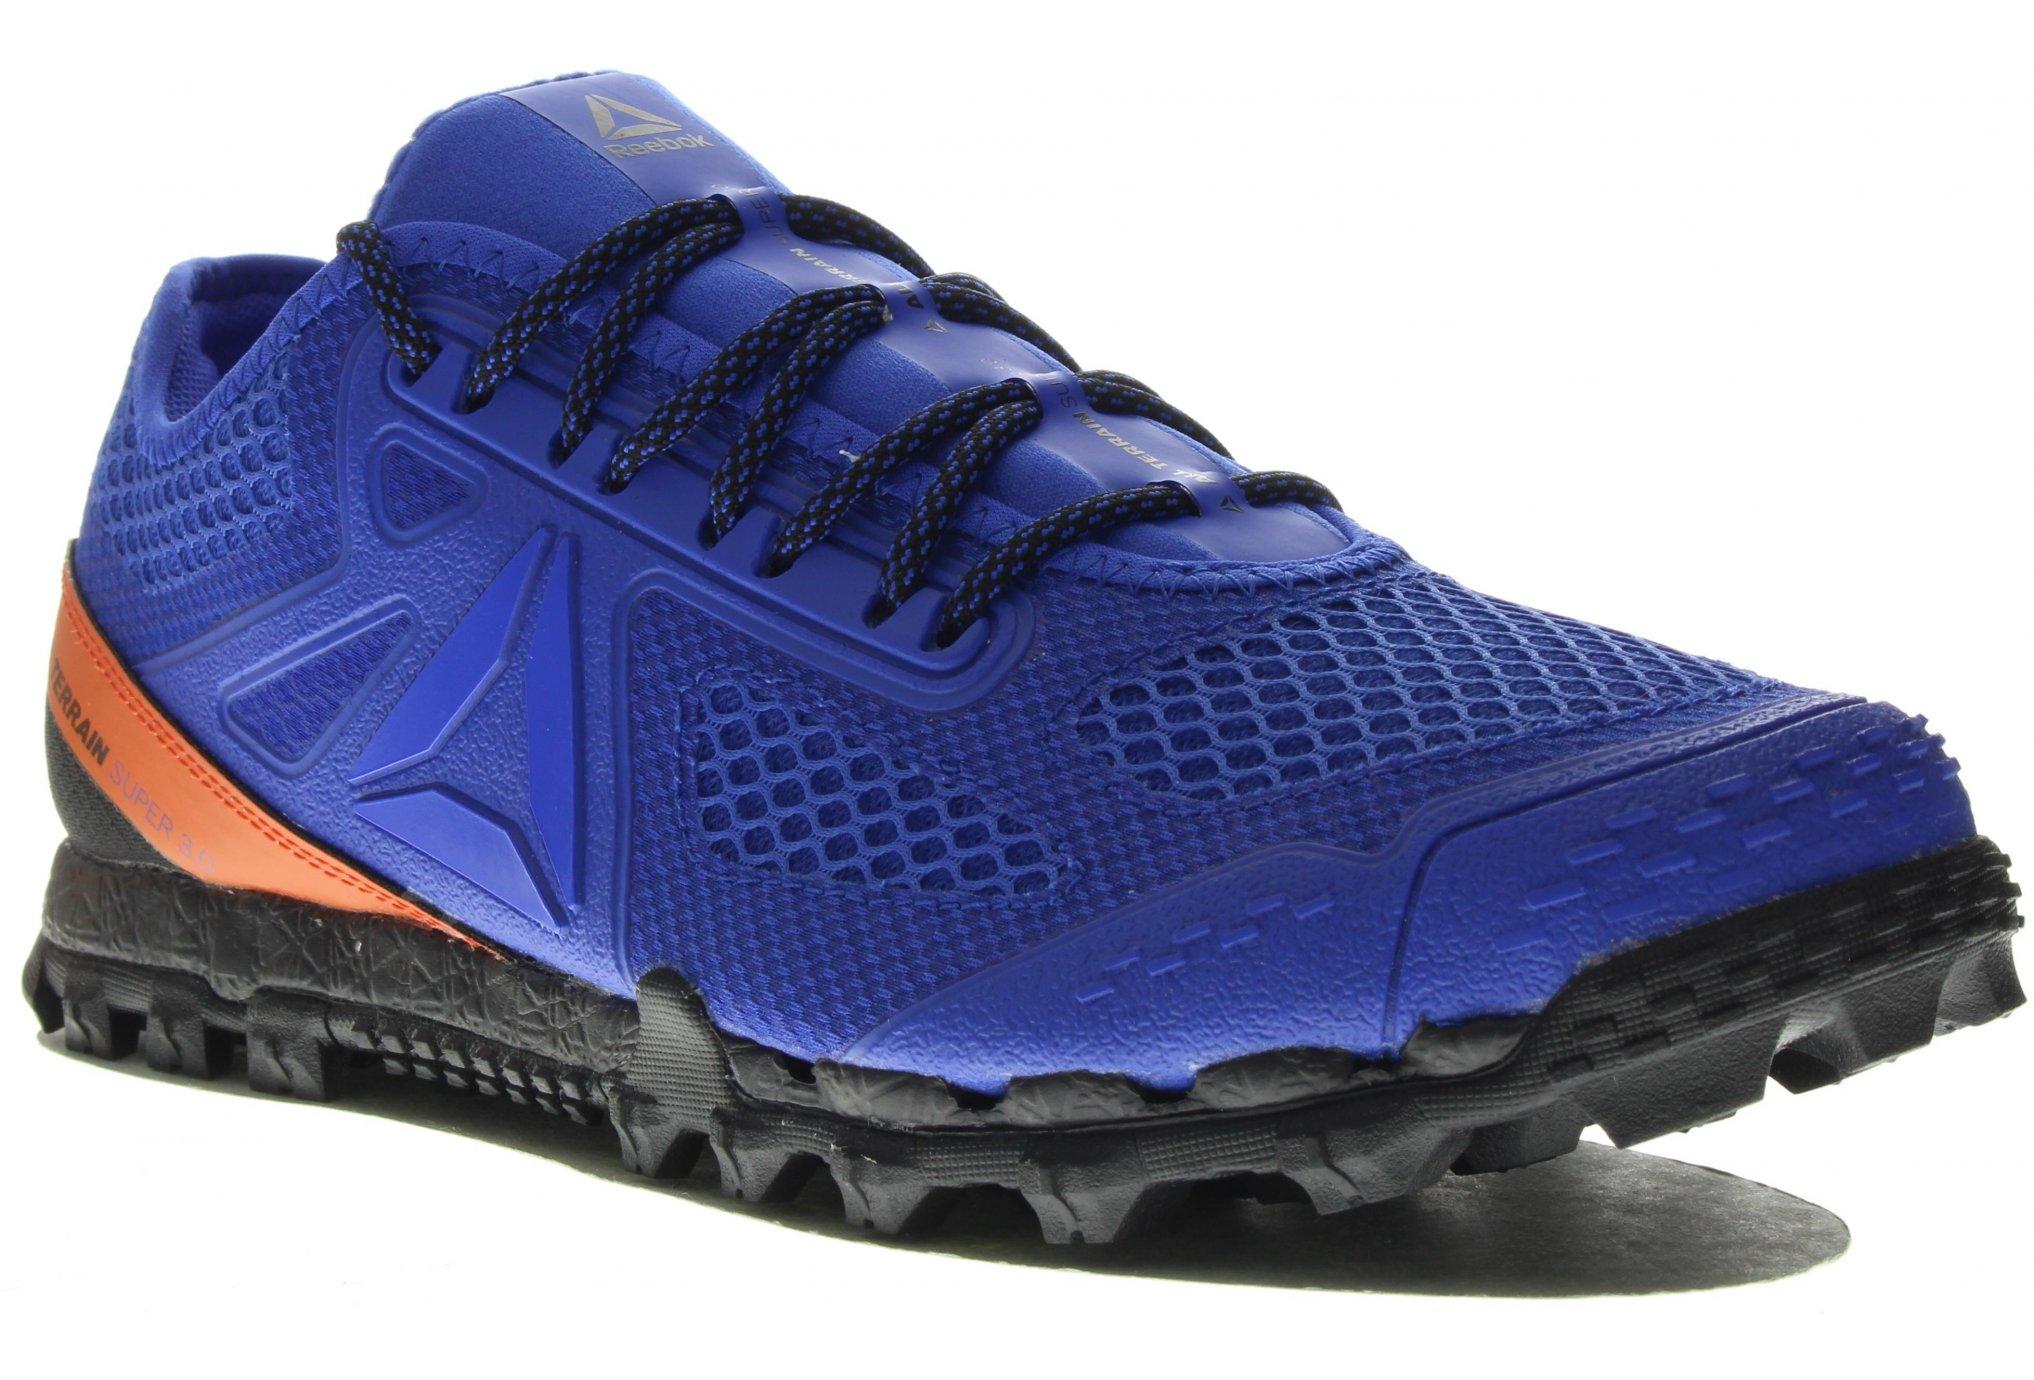 Reebok All terrain super 3.0 m chaussures homme